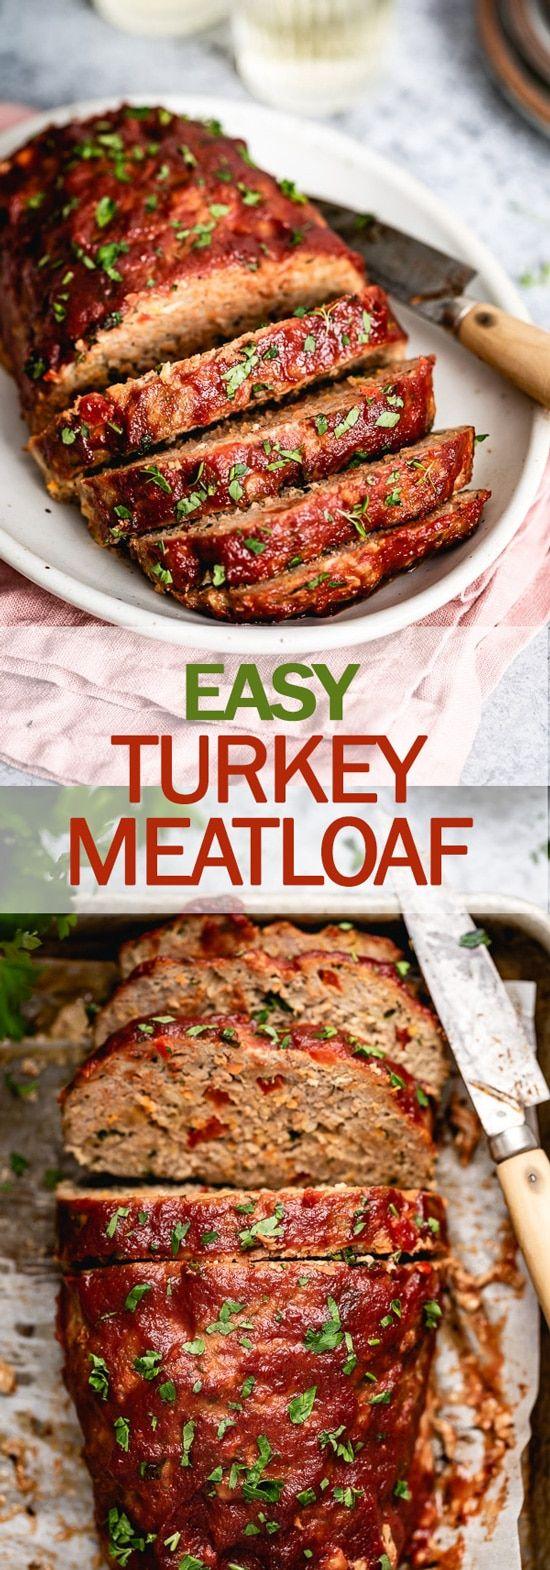 The Best Ground Turkey Meatloaf Recipe Video Foolproof Living Recipe Ground Turkey Recipes Healthy Healthy Turkey Recipes Turkey Meatloaf Recipes